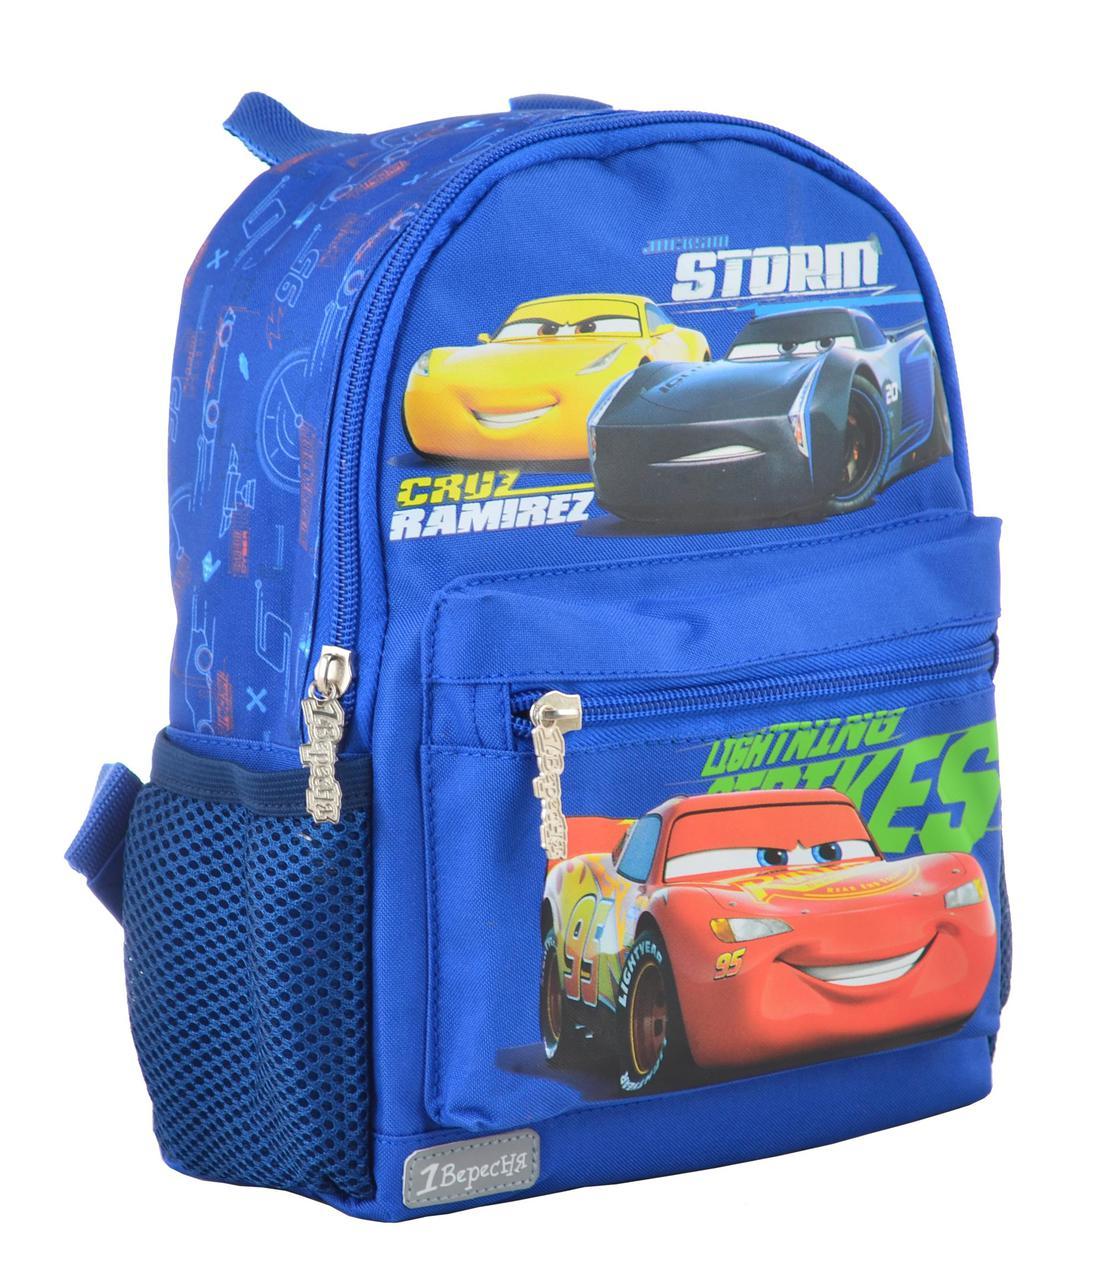 Рюкзак детский 1 Вересня K-16 Cars